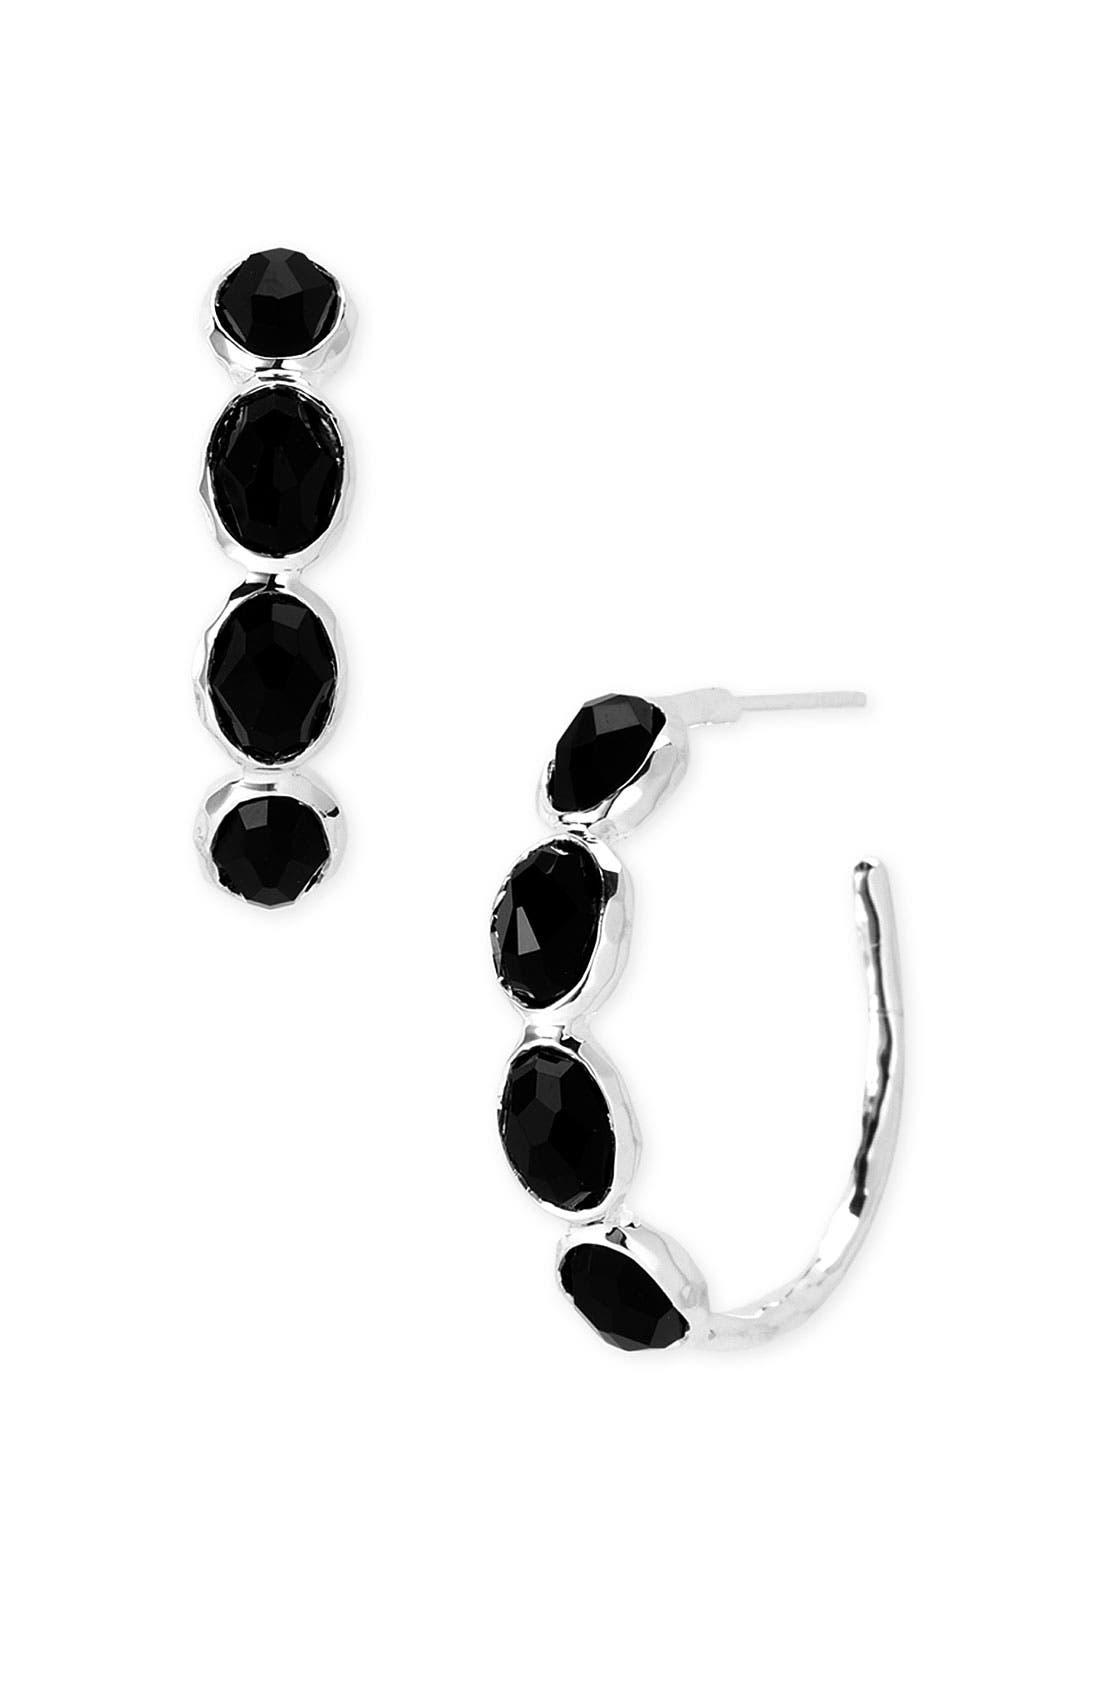 Main Image - Ippolita 'Rock Candy - Number 2' 4-Stone Hoop Earrings